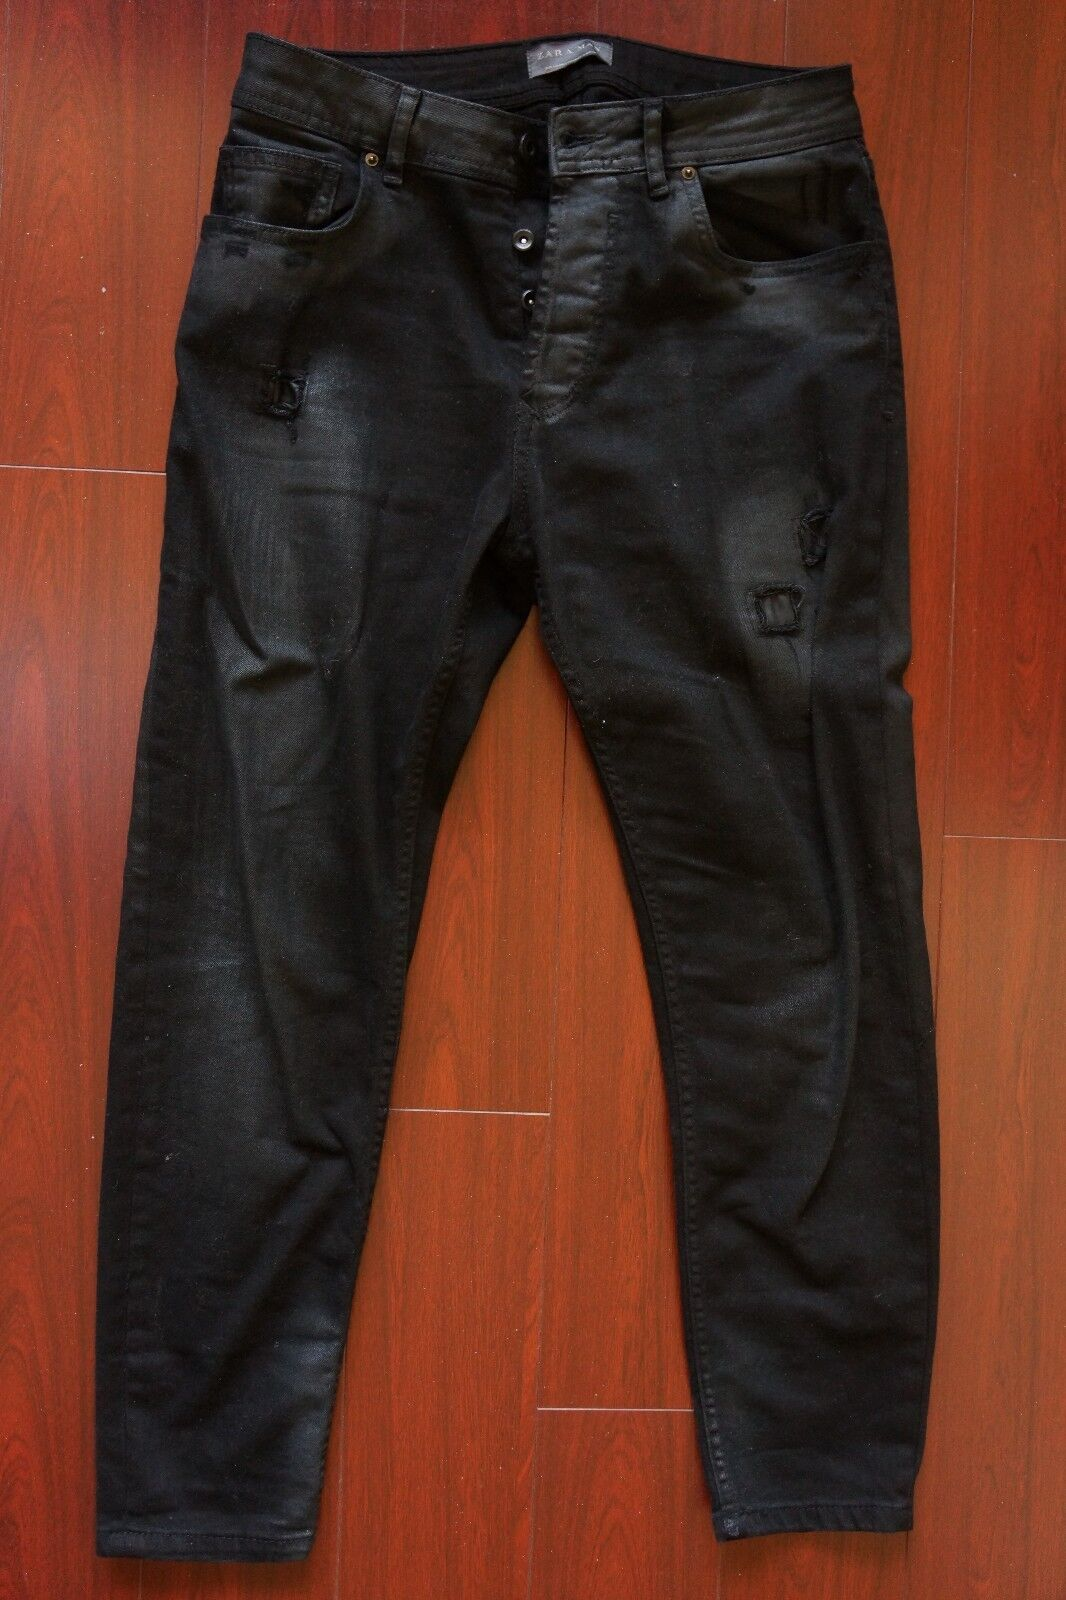 ffb27717 купить ZARA MAN BIKER JACKET, с доставкой Zara Men Man Washed Black  Destroyed Denim Jeans